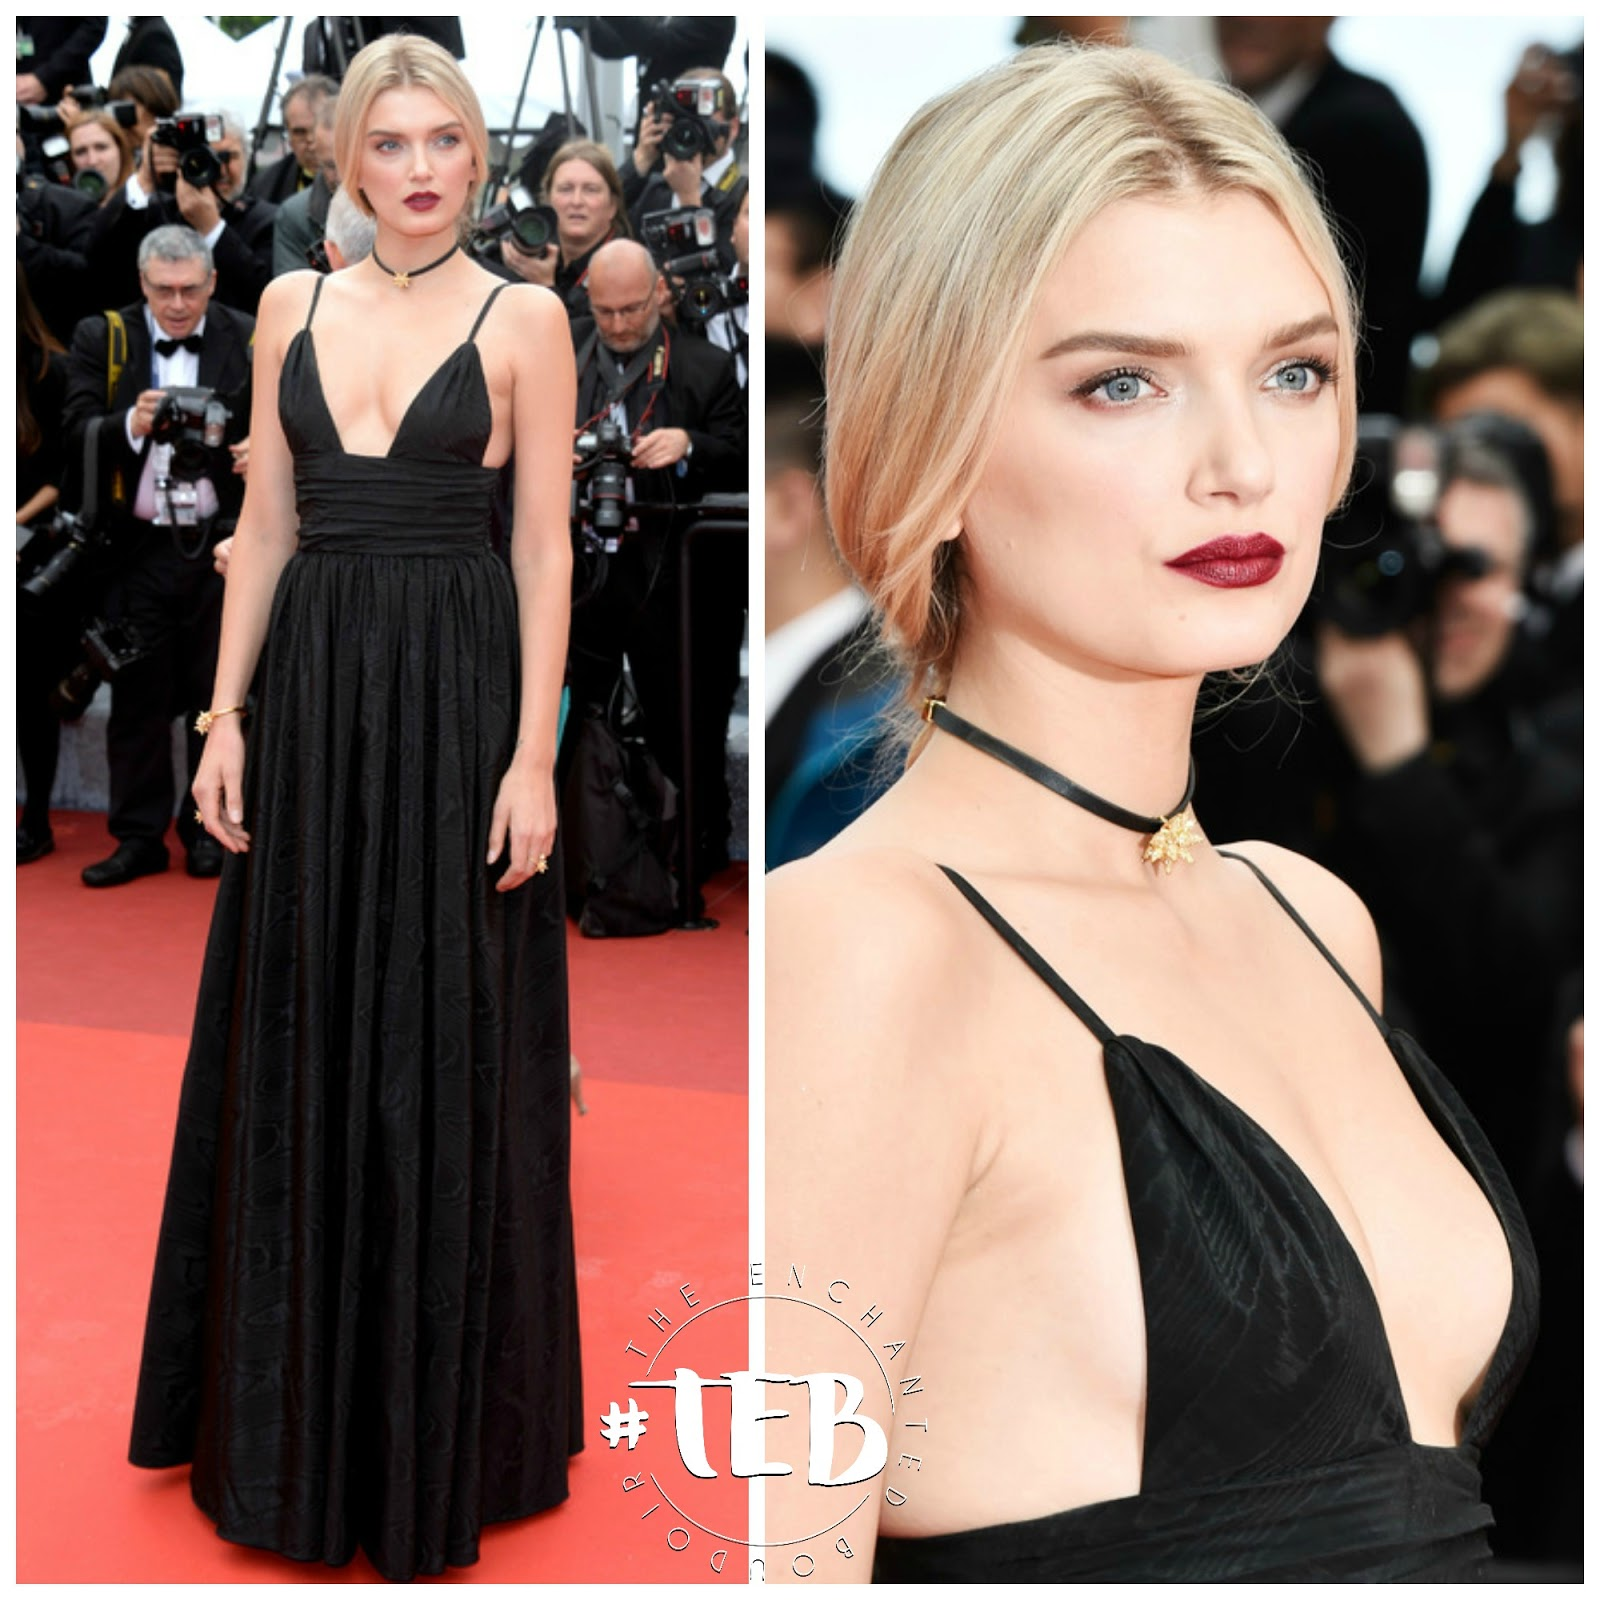 Lily_Donaldson_Cannes_2016_Miu_Miu_Saint_Laurent